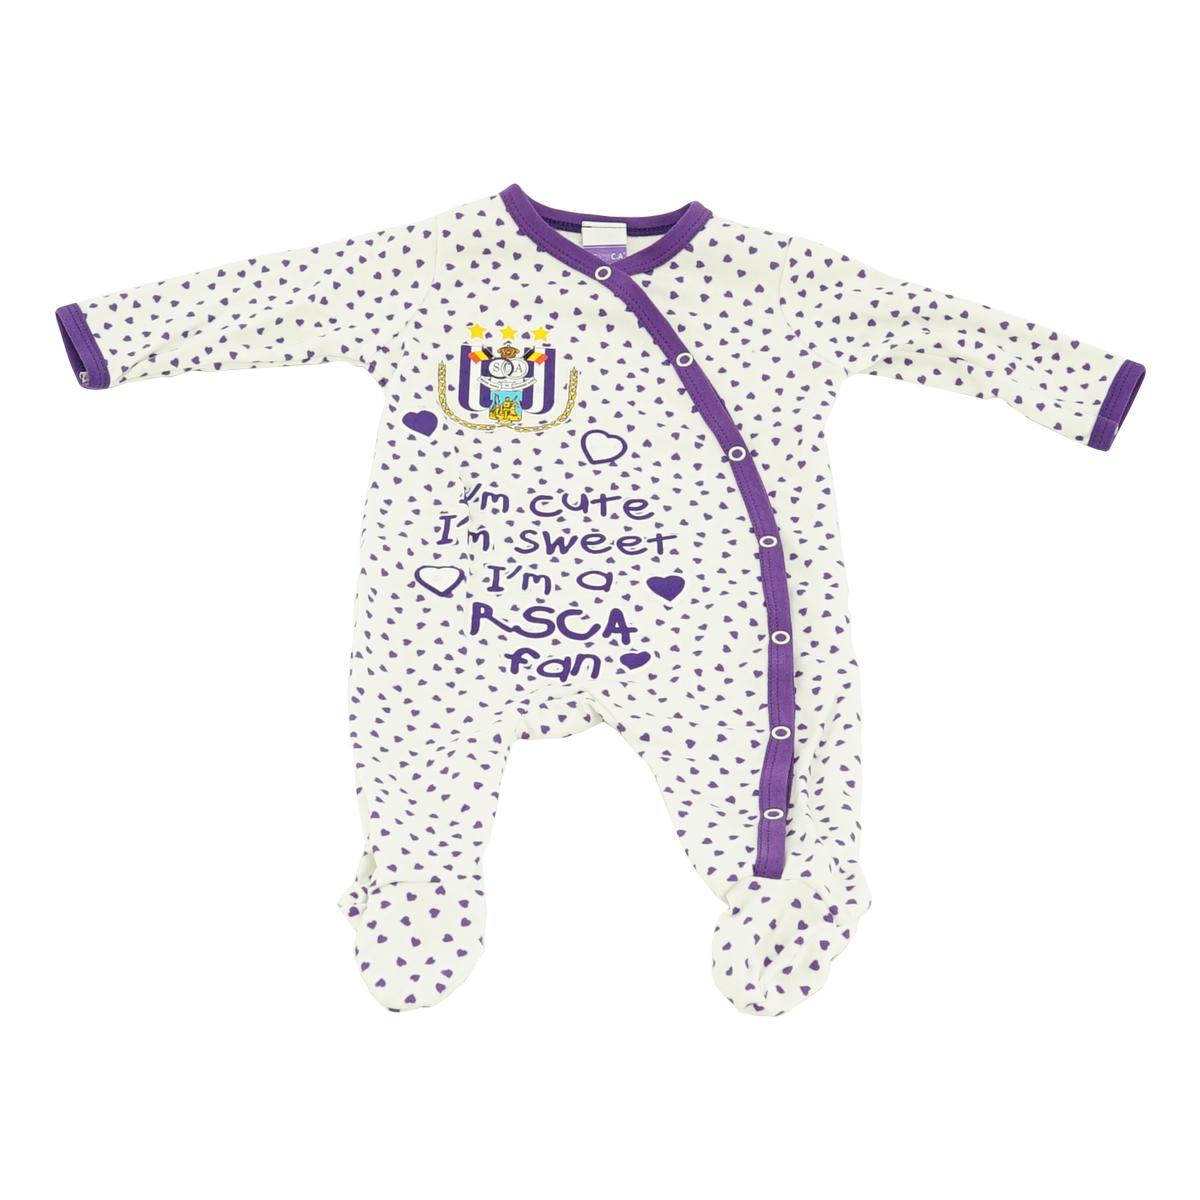 RSCA Pyjama Baby I'm cute, I'm sweet, I'm a RSCA Fan